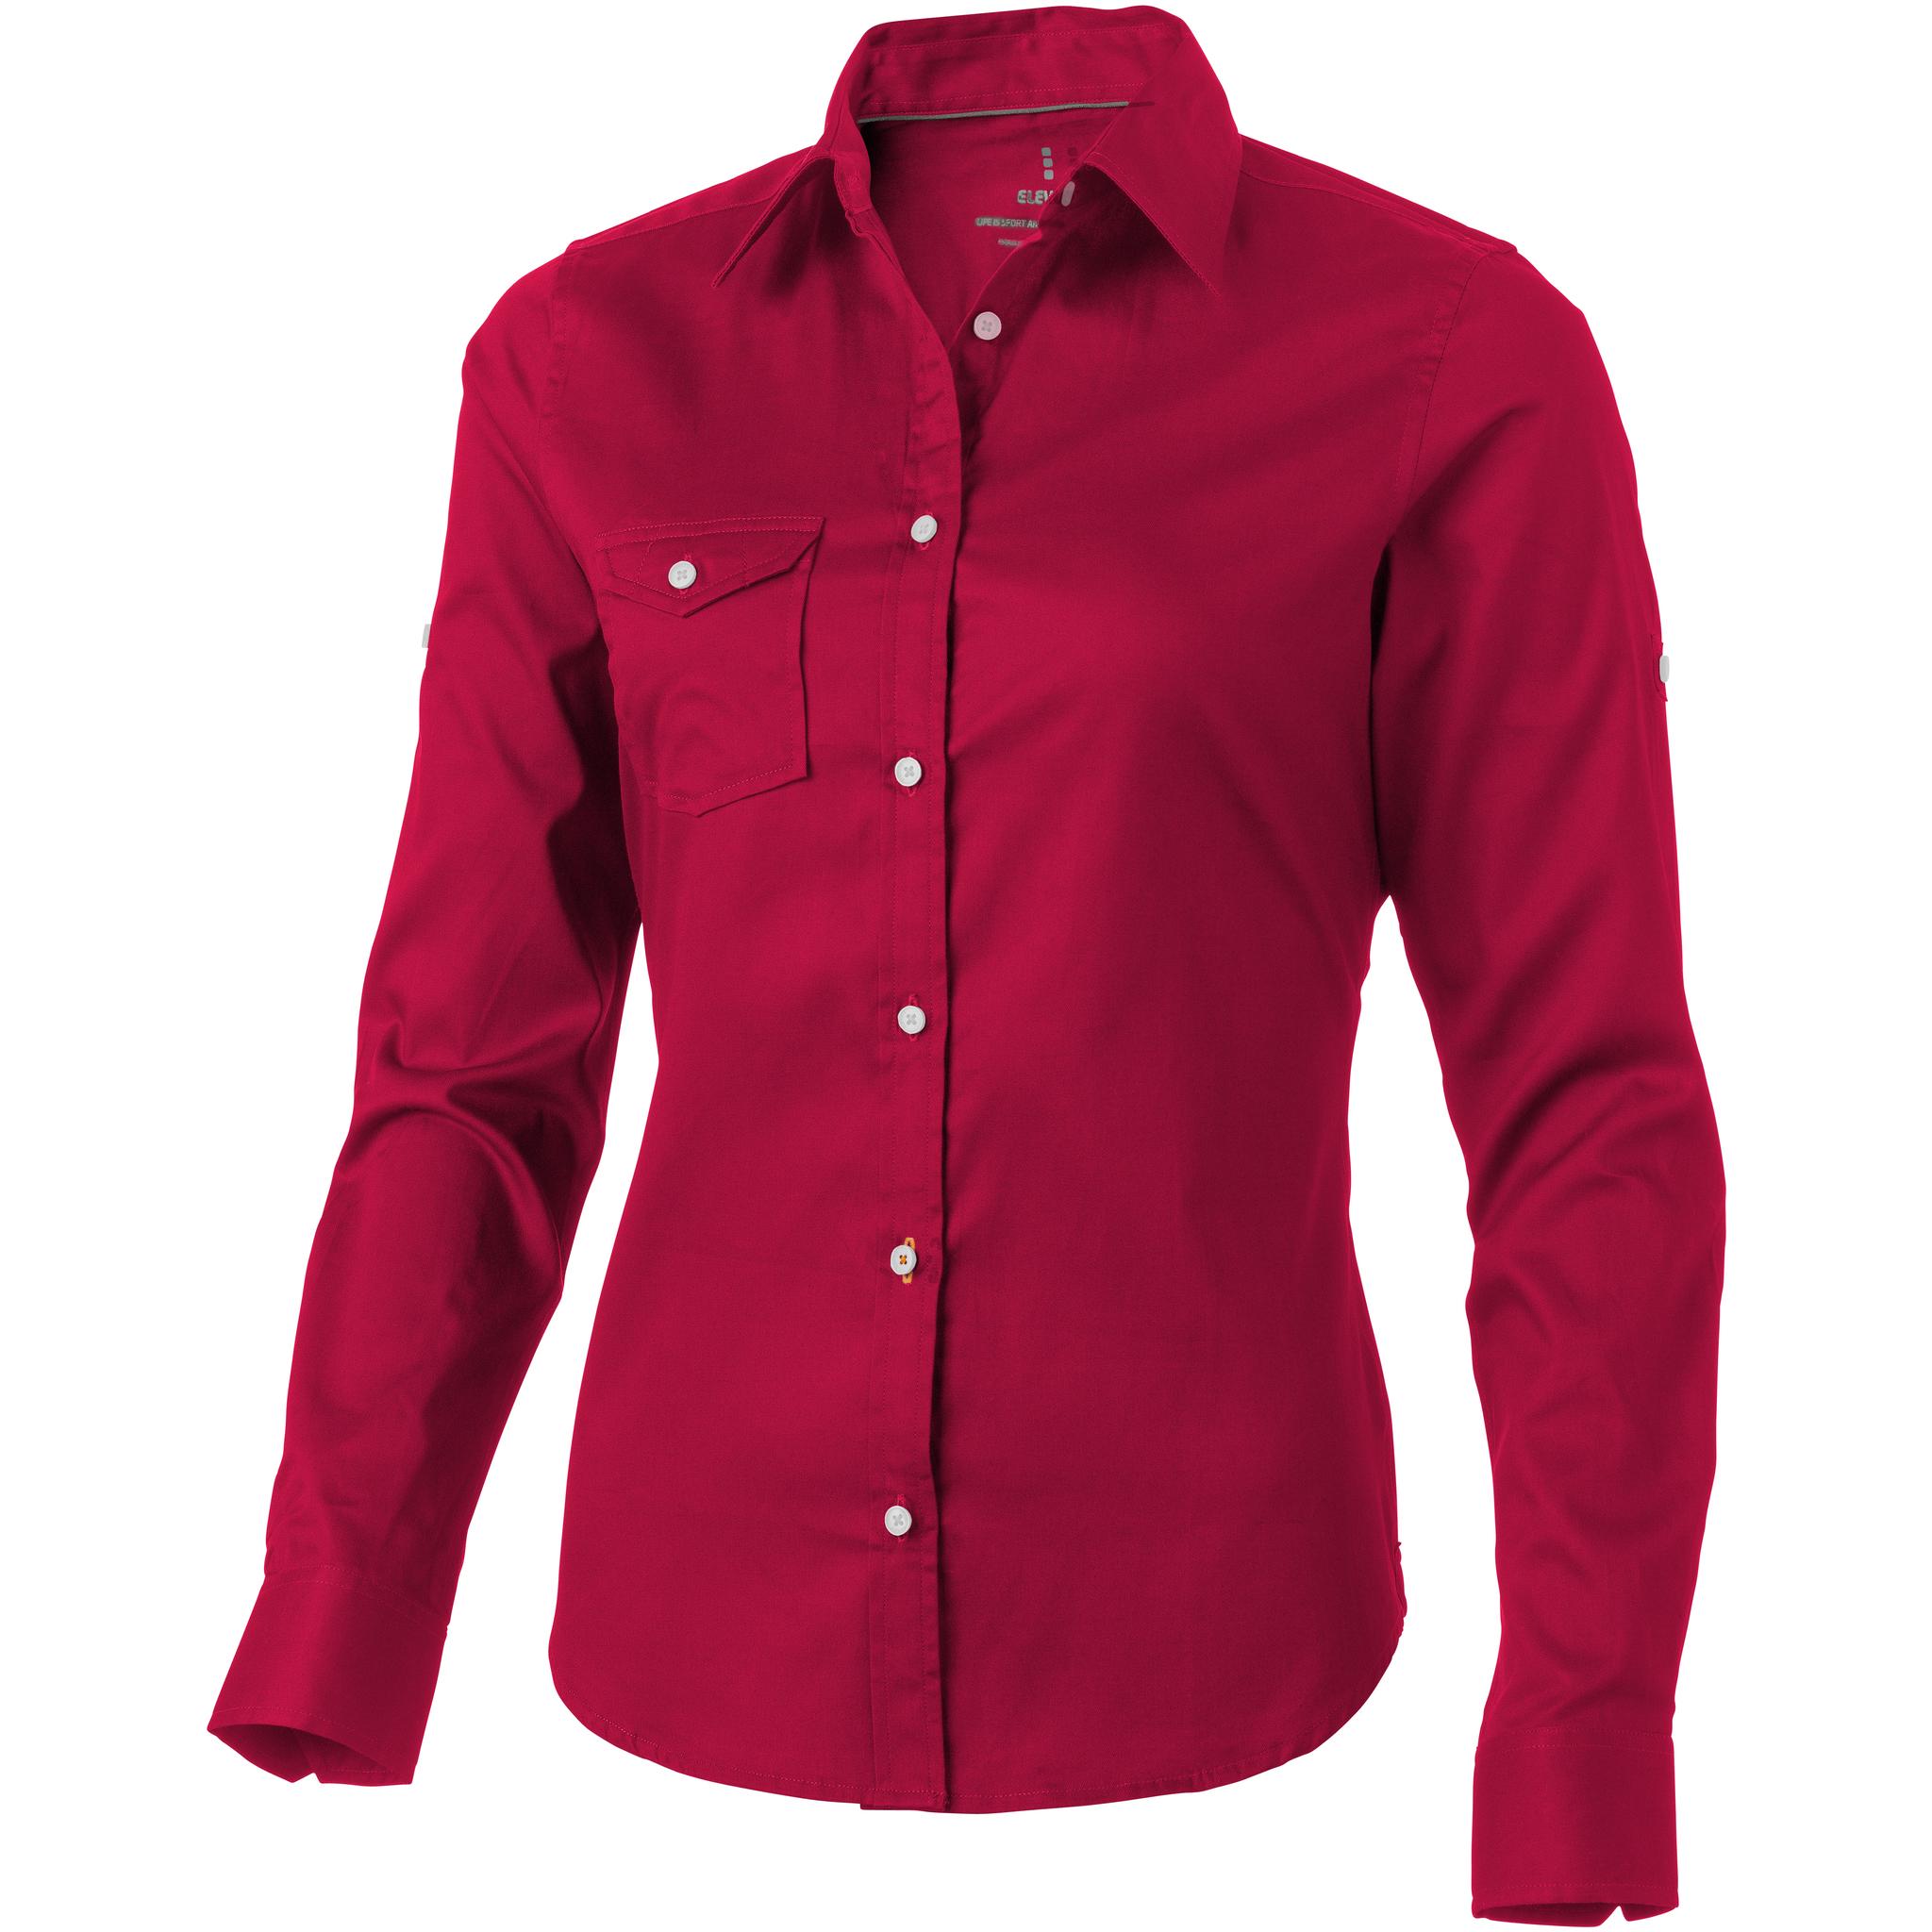 Elevate-Womens-Ladies-Nunavut-Long-Sleeve-Shirt-PF1840